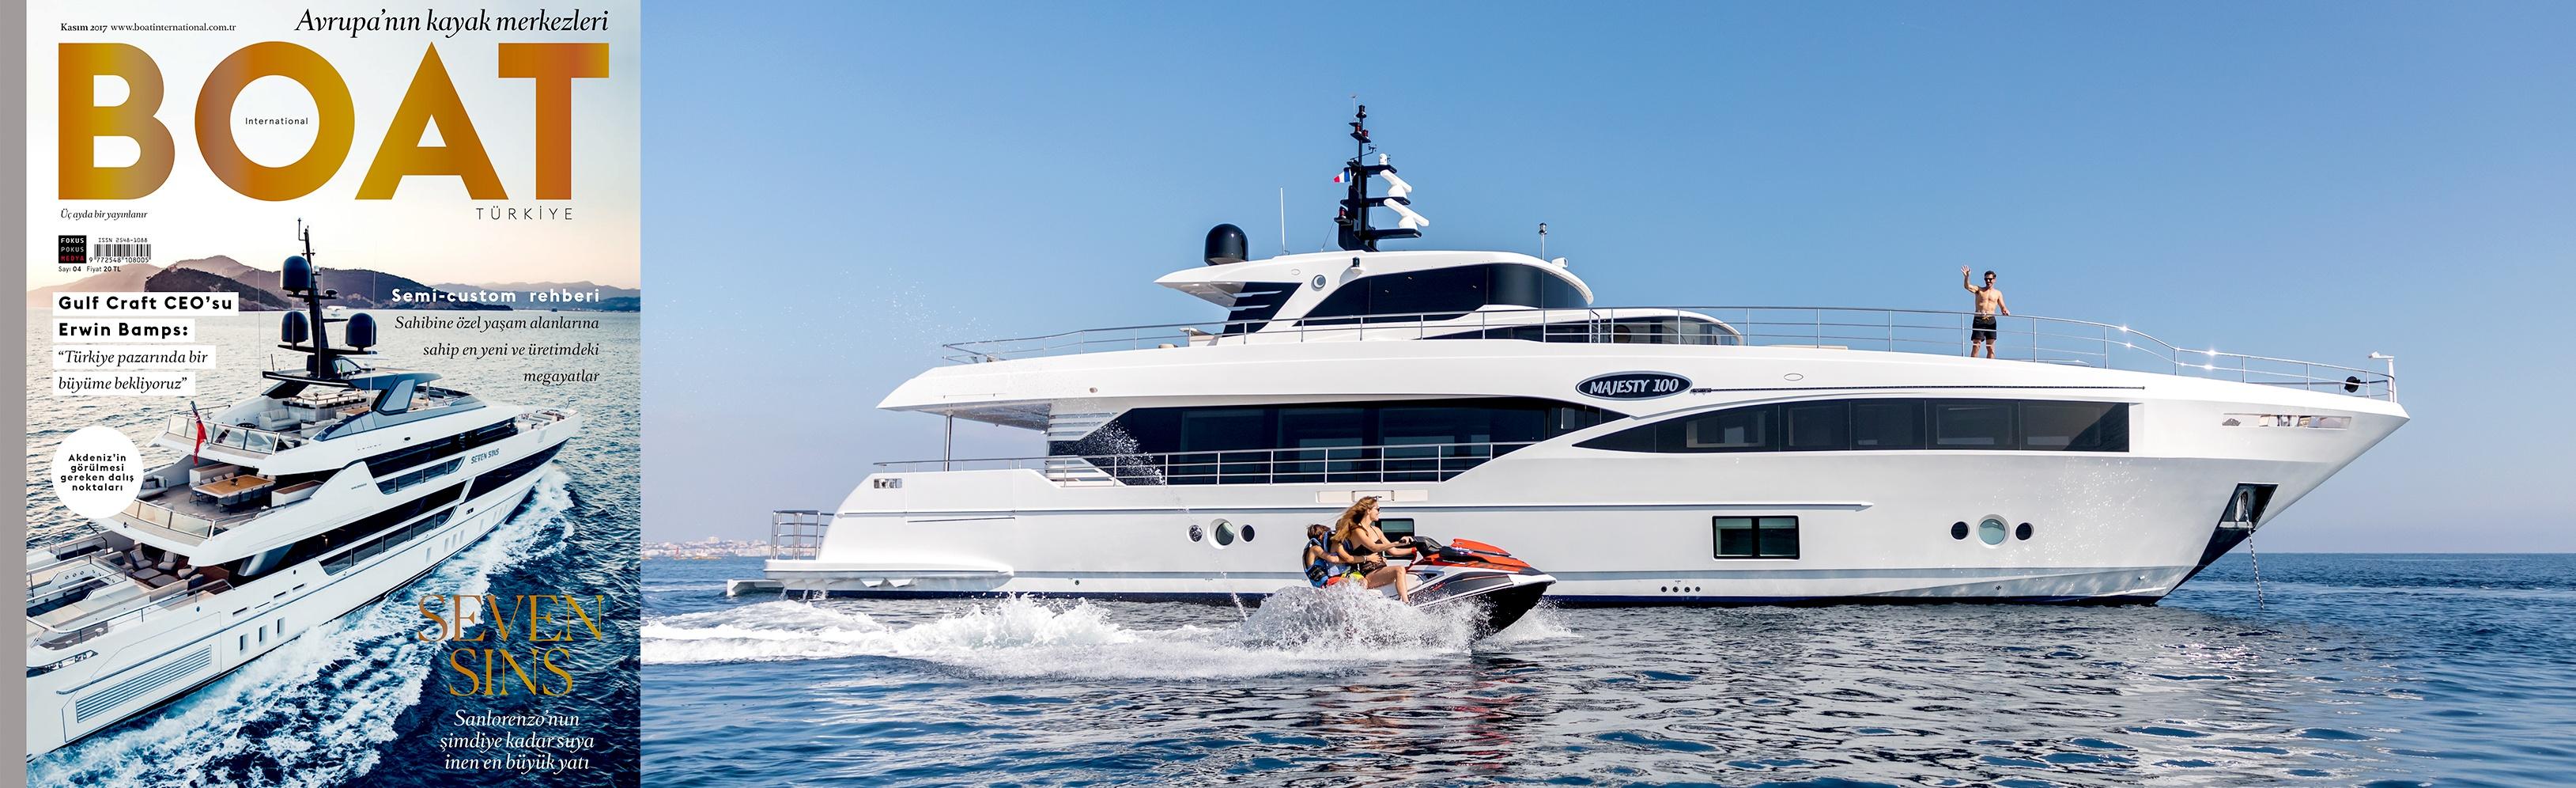 Boat-International-Turkey,-Majesty-100.jpg